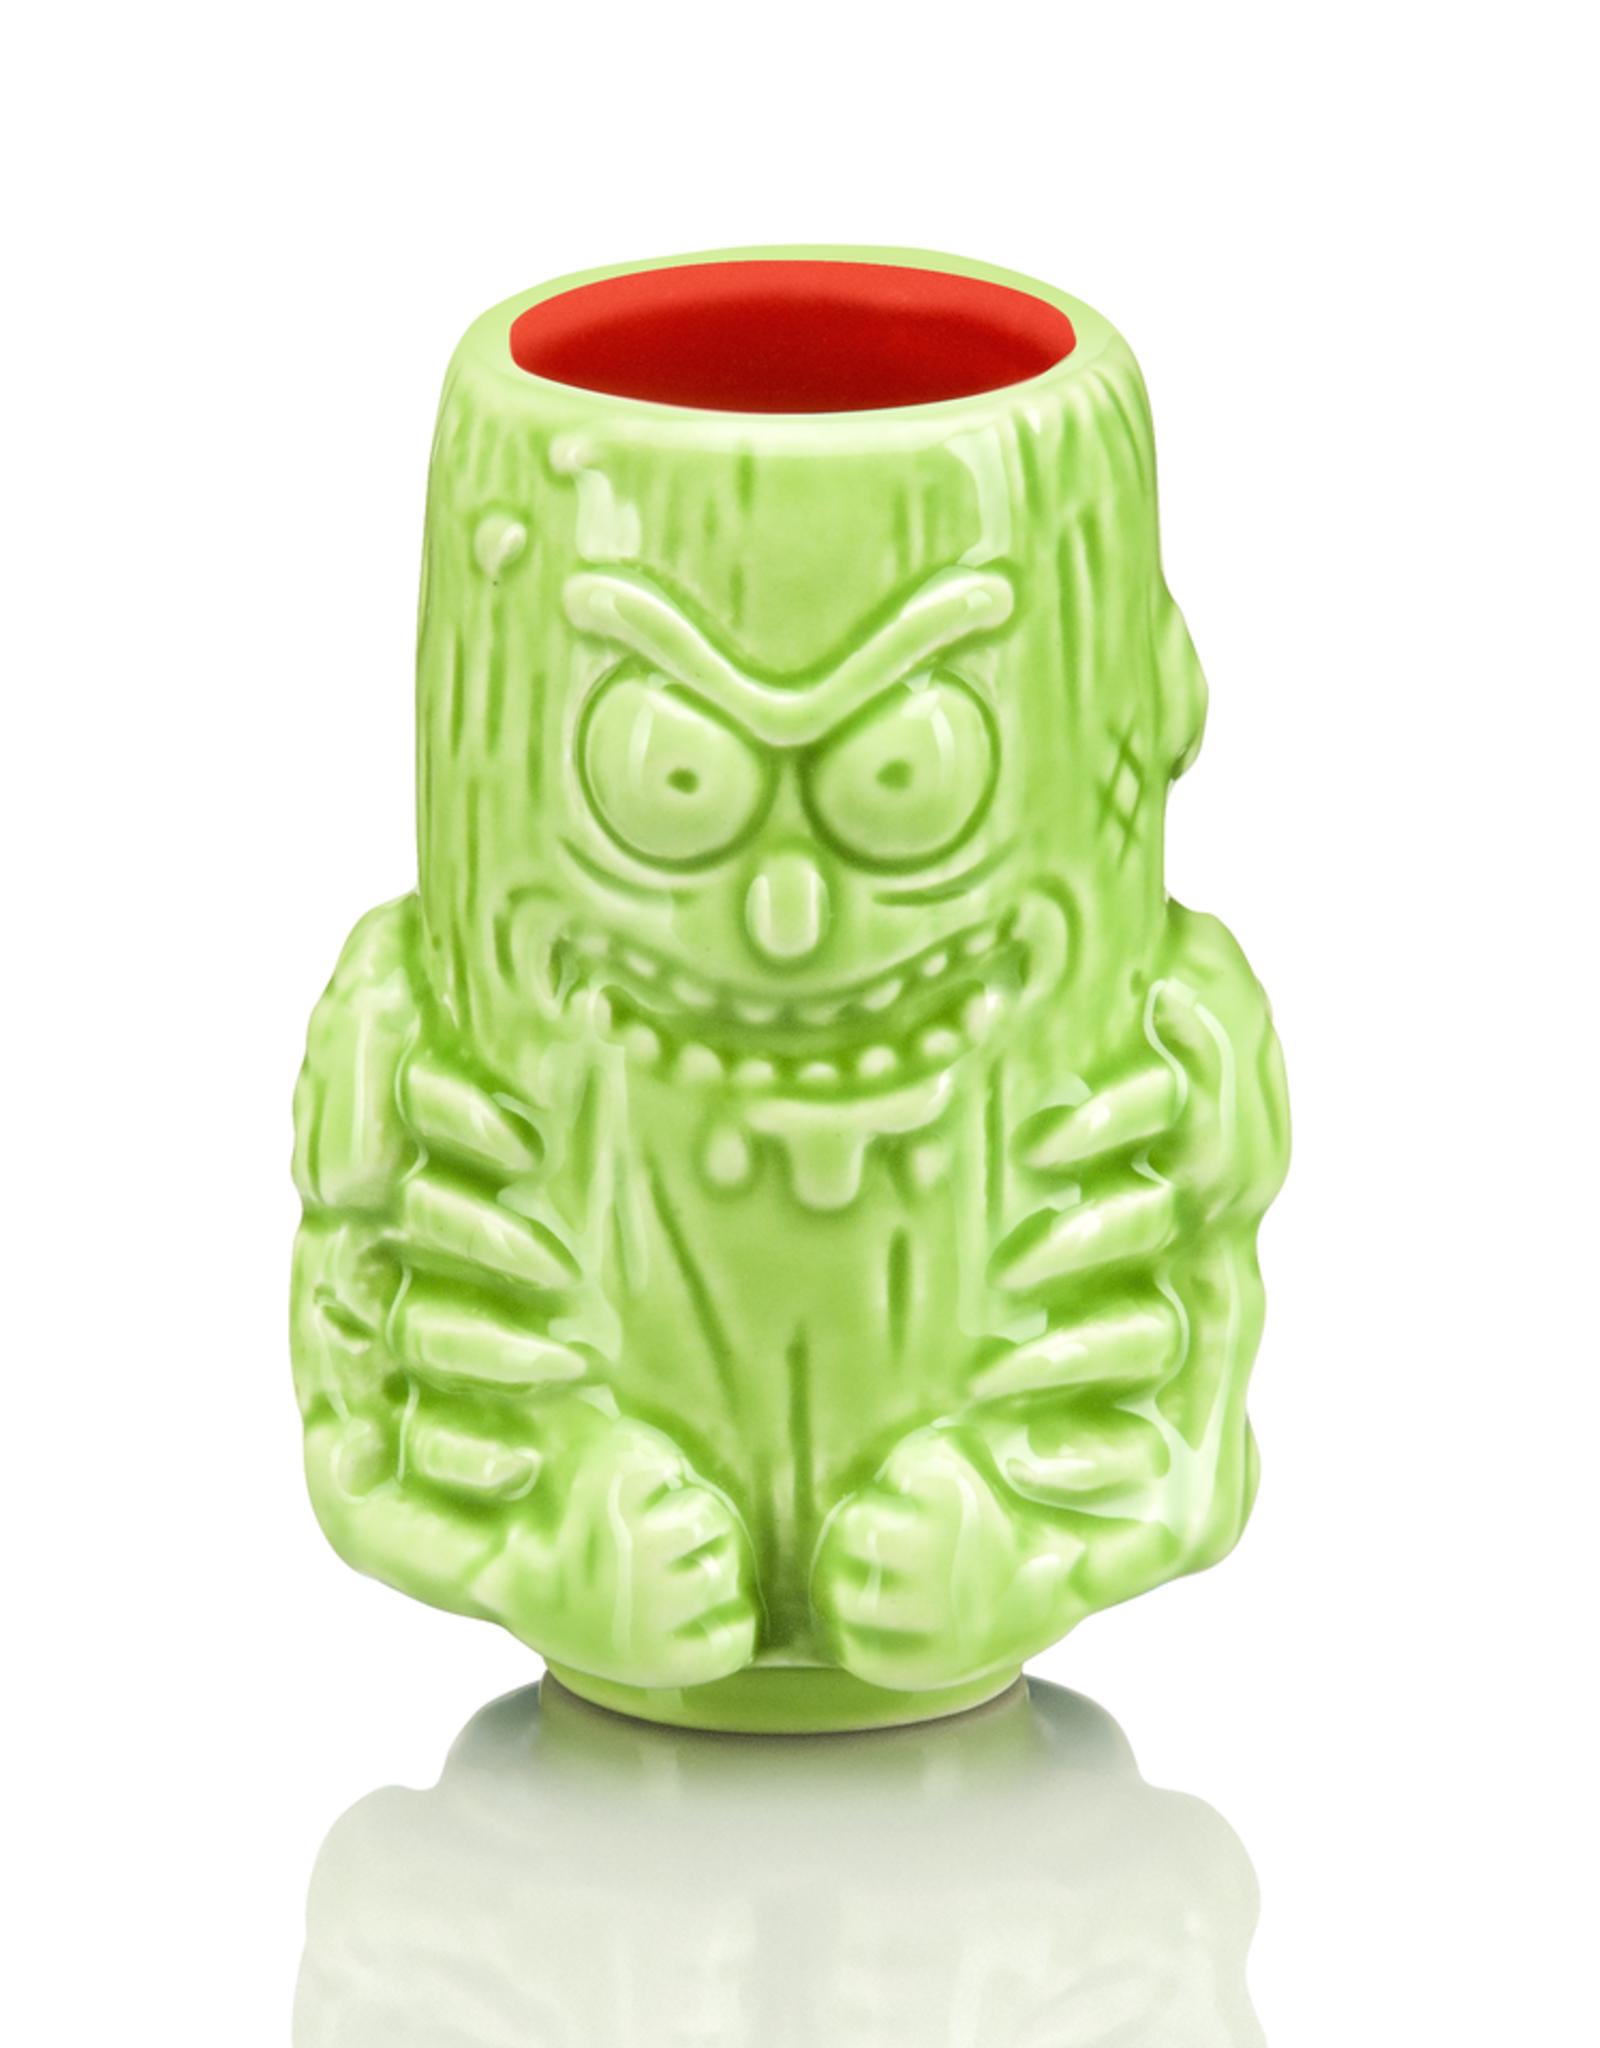 Geeki Tikis - Pickle Rick Mini Muglet